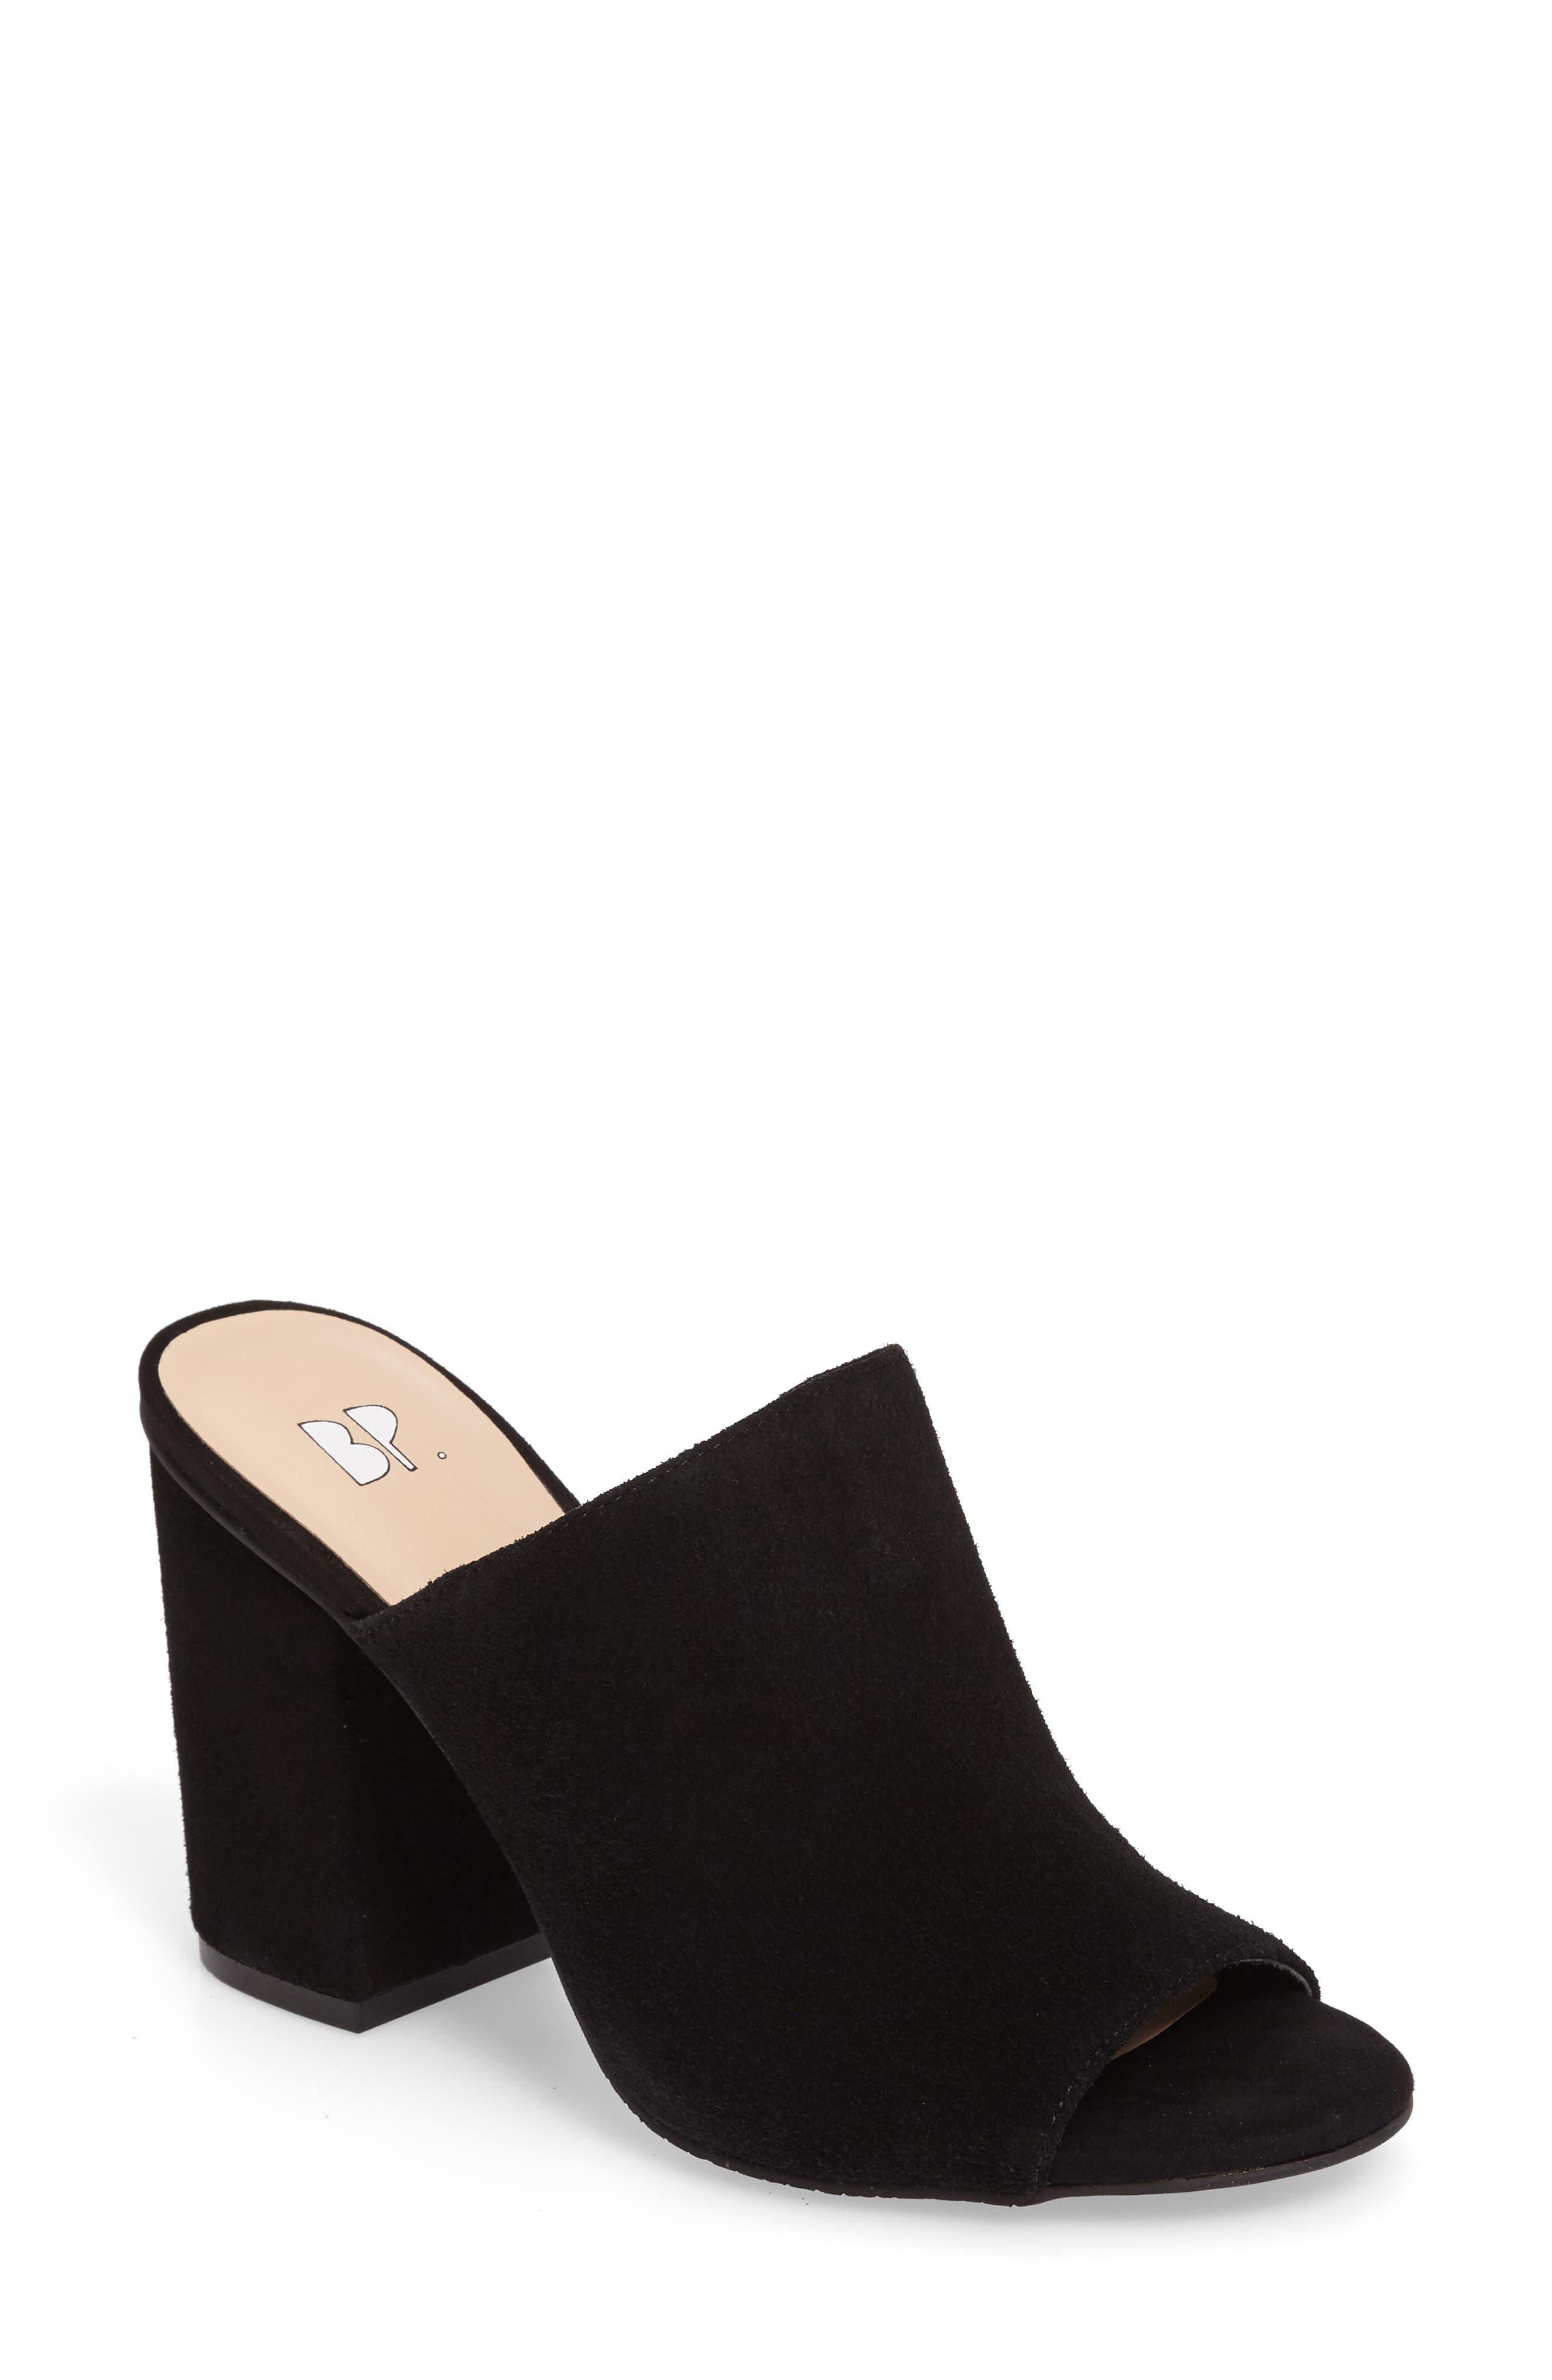 Tale Block Heel Sandal,                             Main thumbnail 1, color,                             001